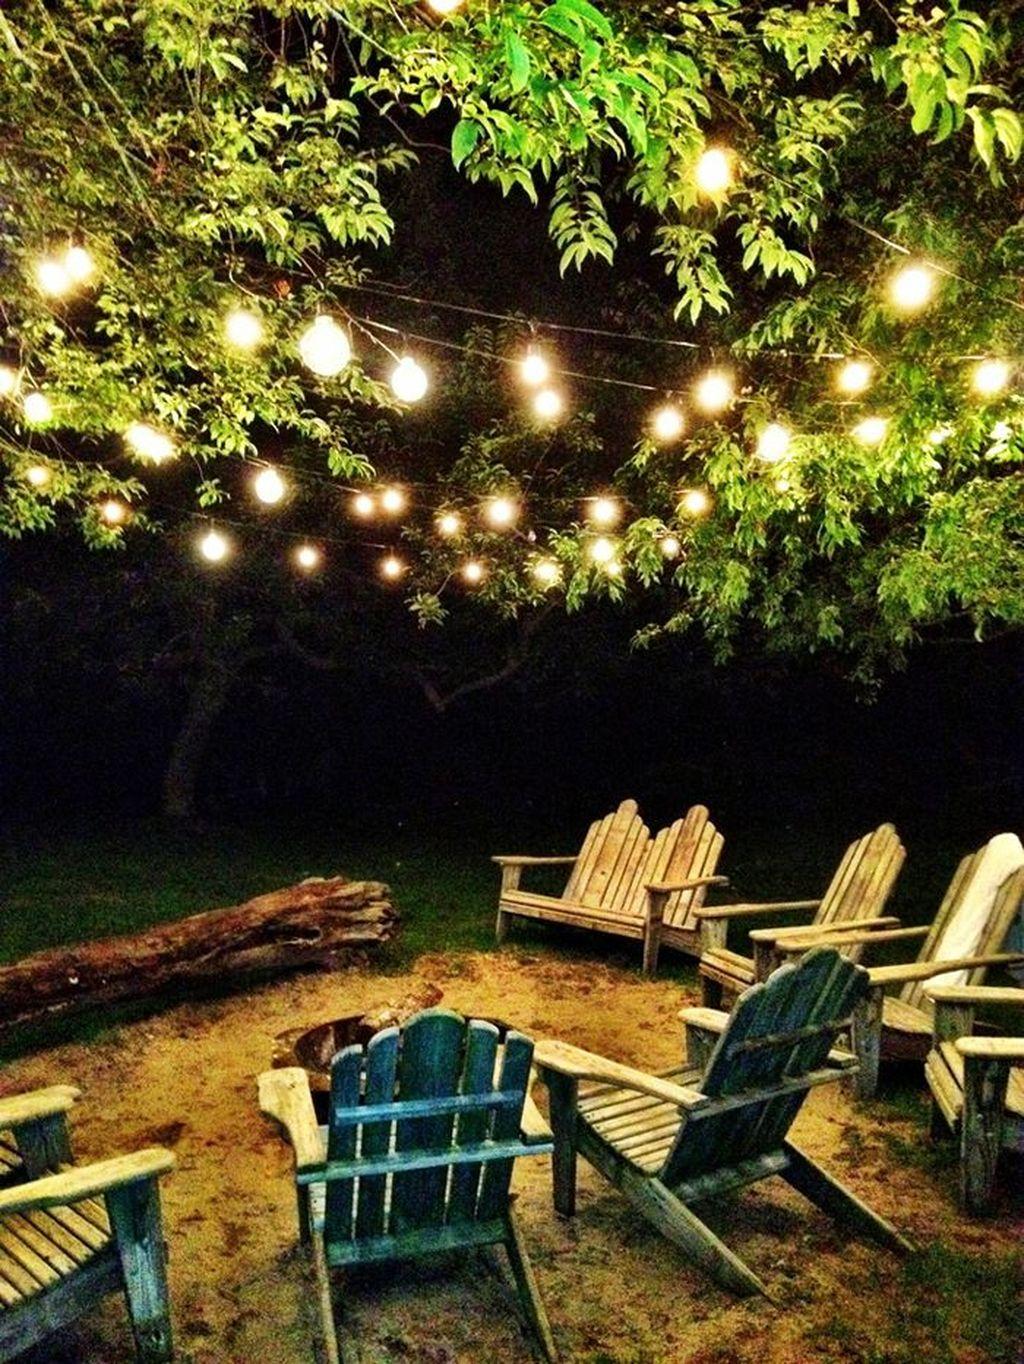 The Best Romantic Backyard Decorating Ideas 30